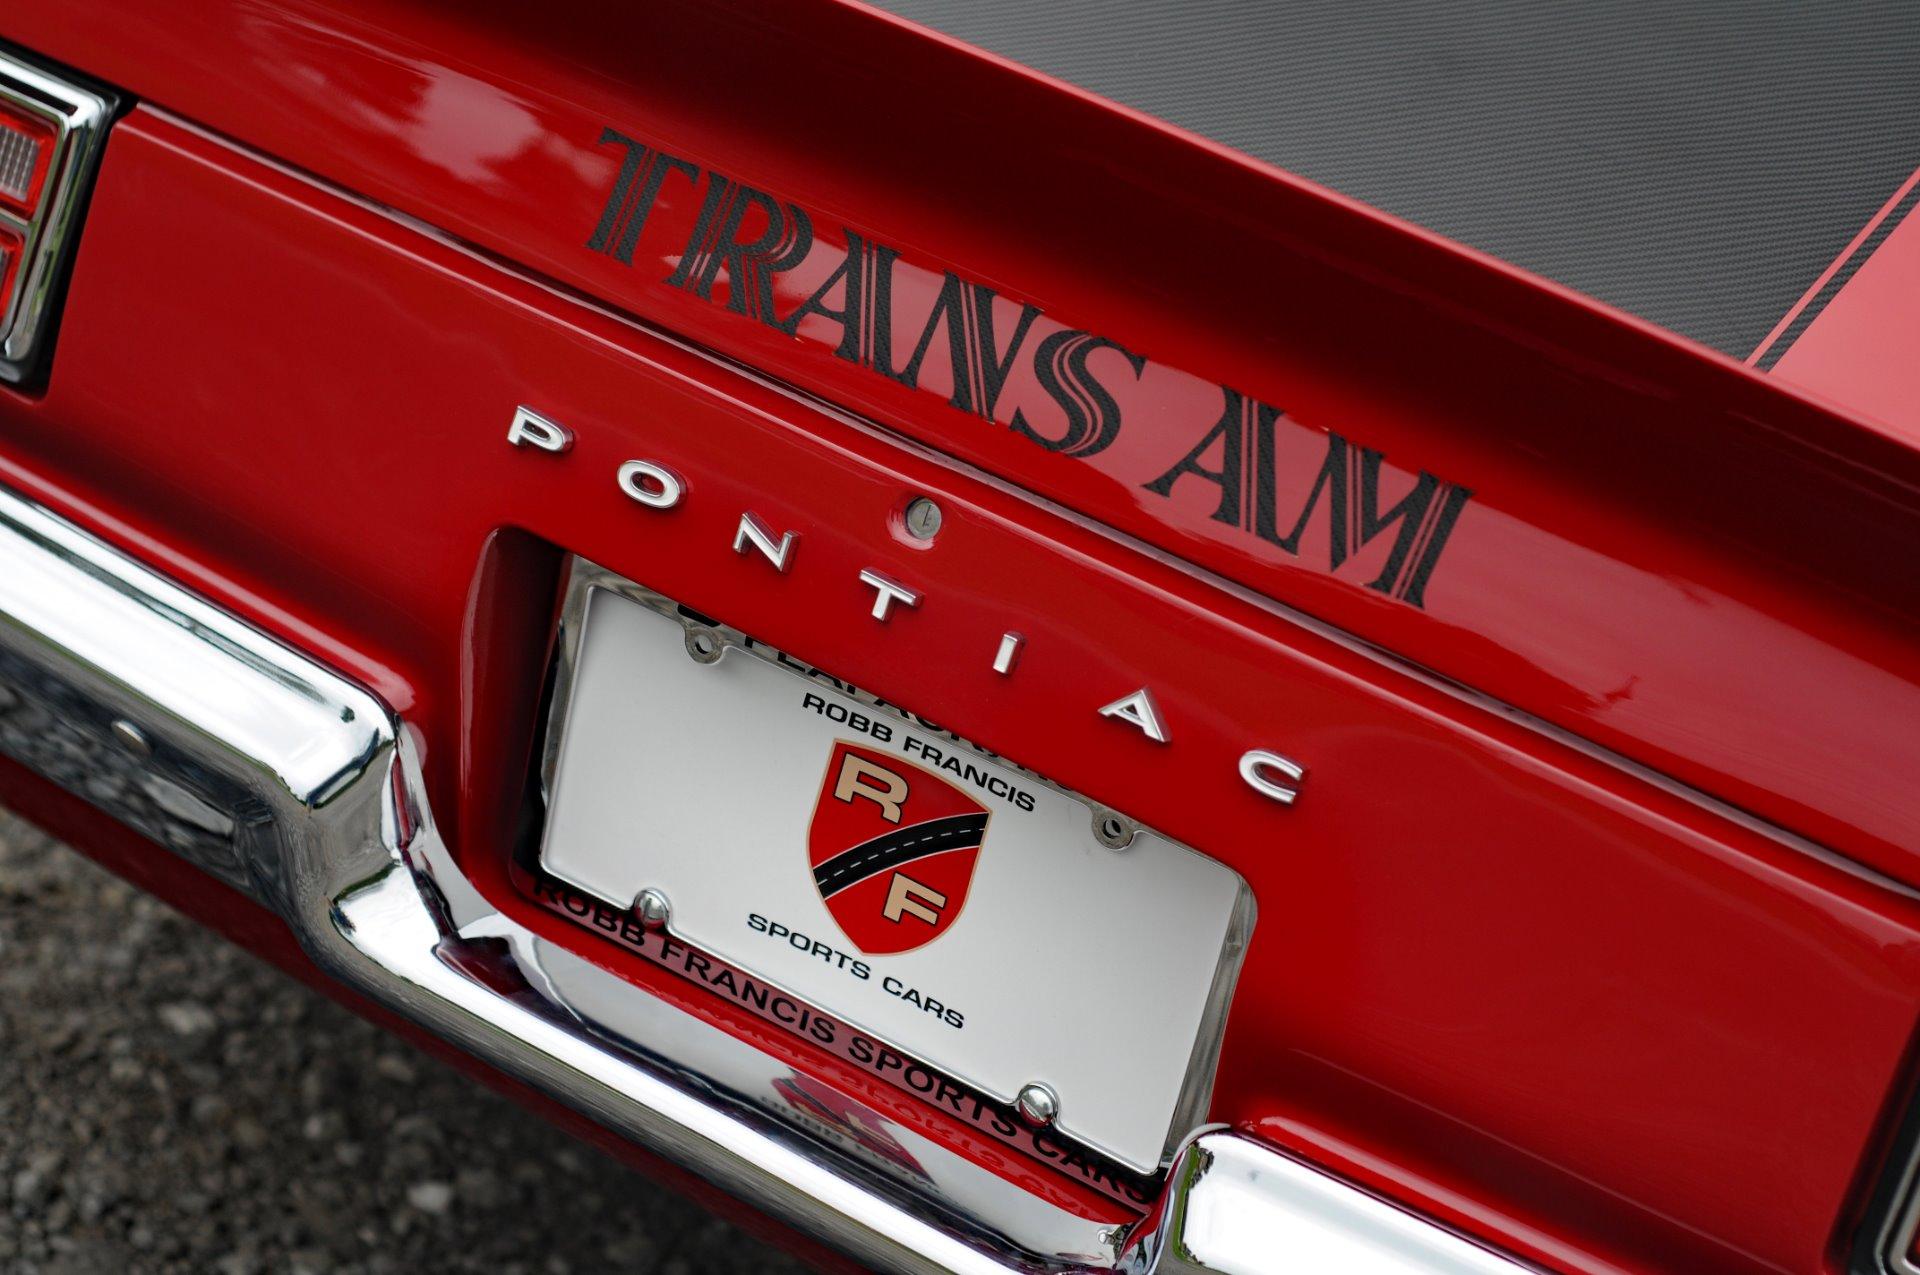 Used-1972-Pontiac-Firebird-Trans-Am-Resto-Mod